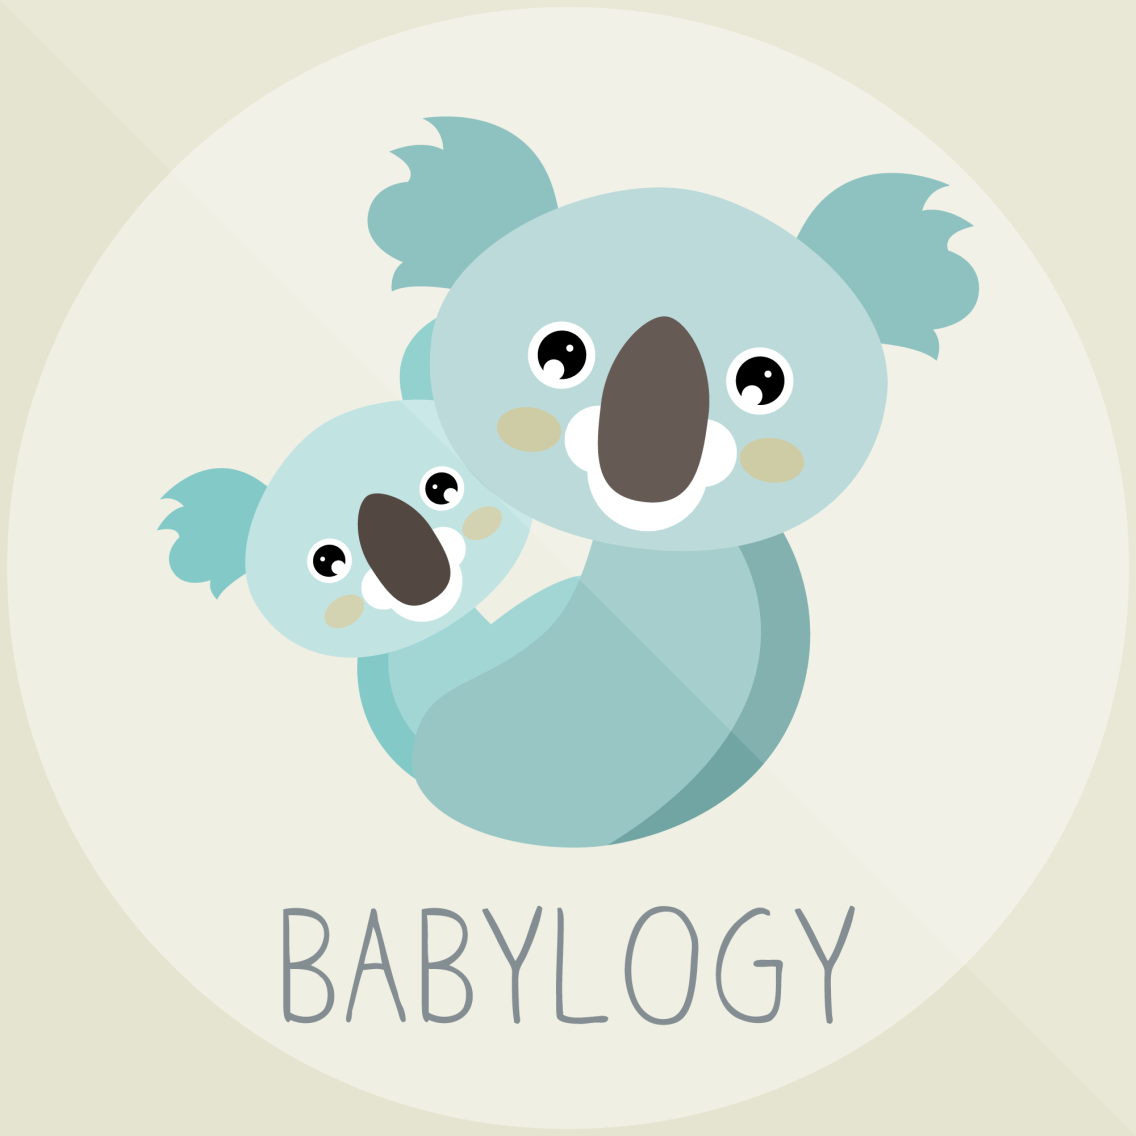 babylogy-logo-design